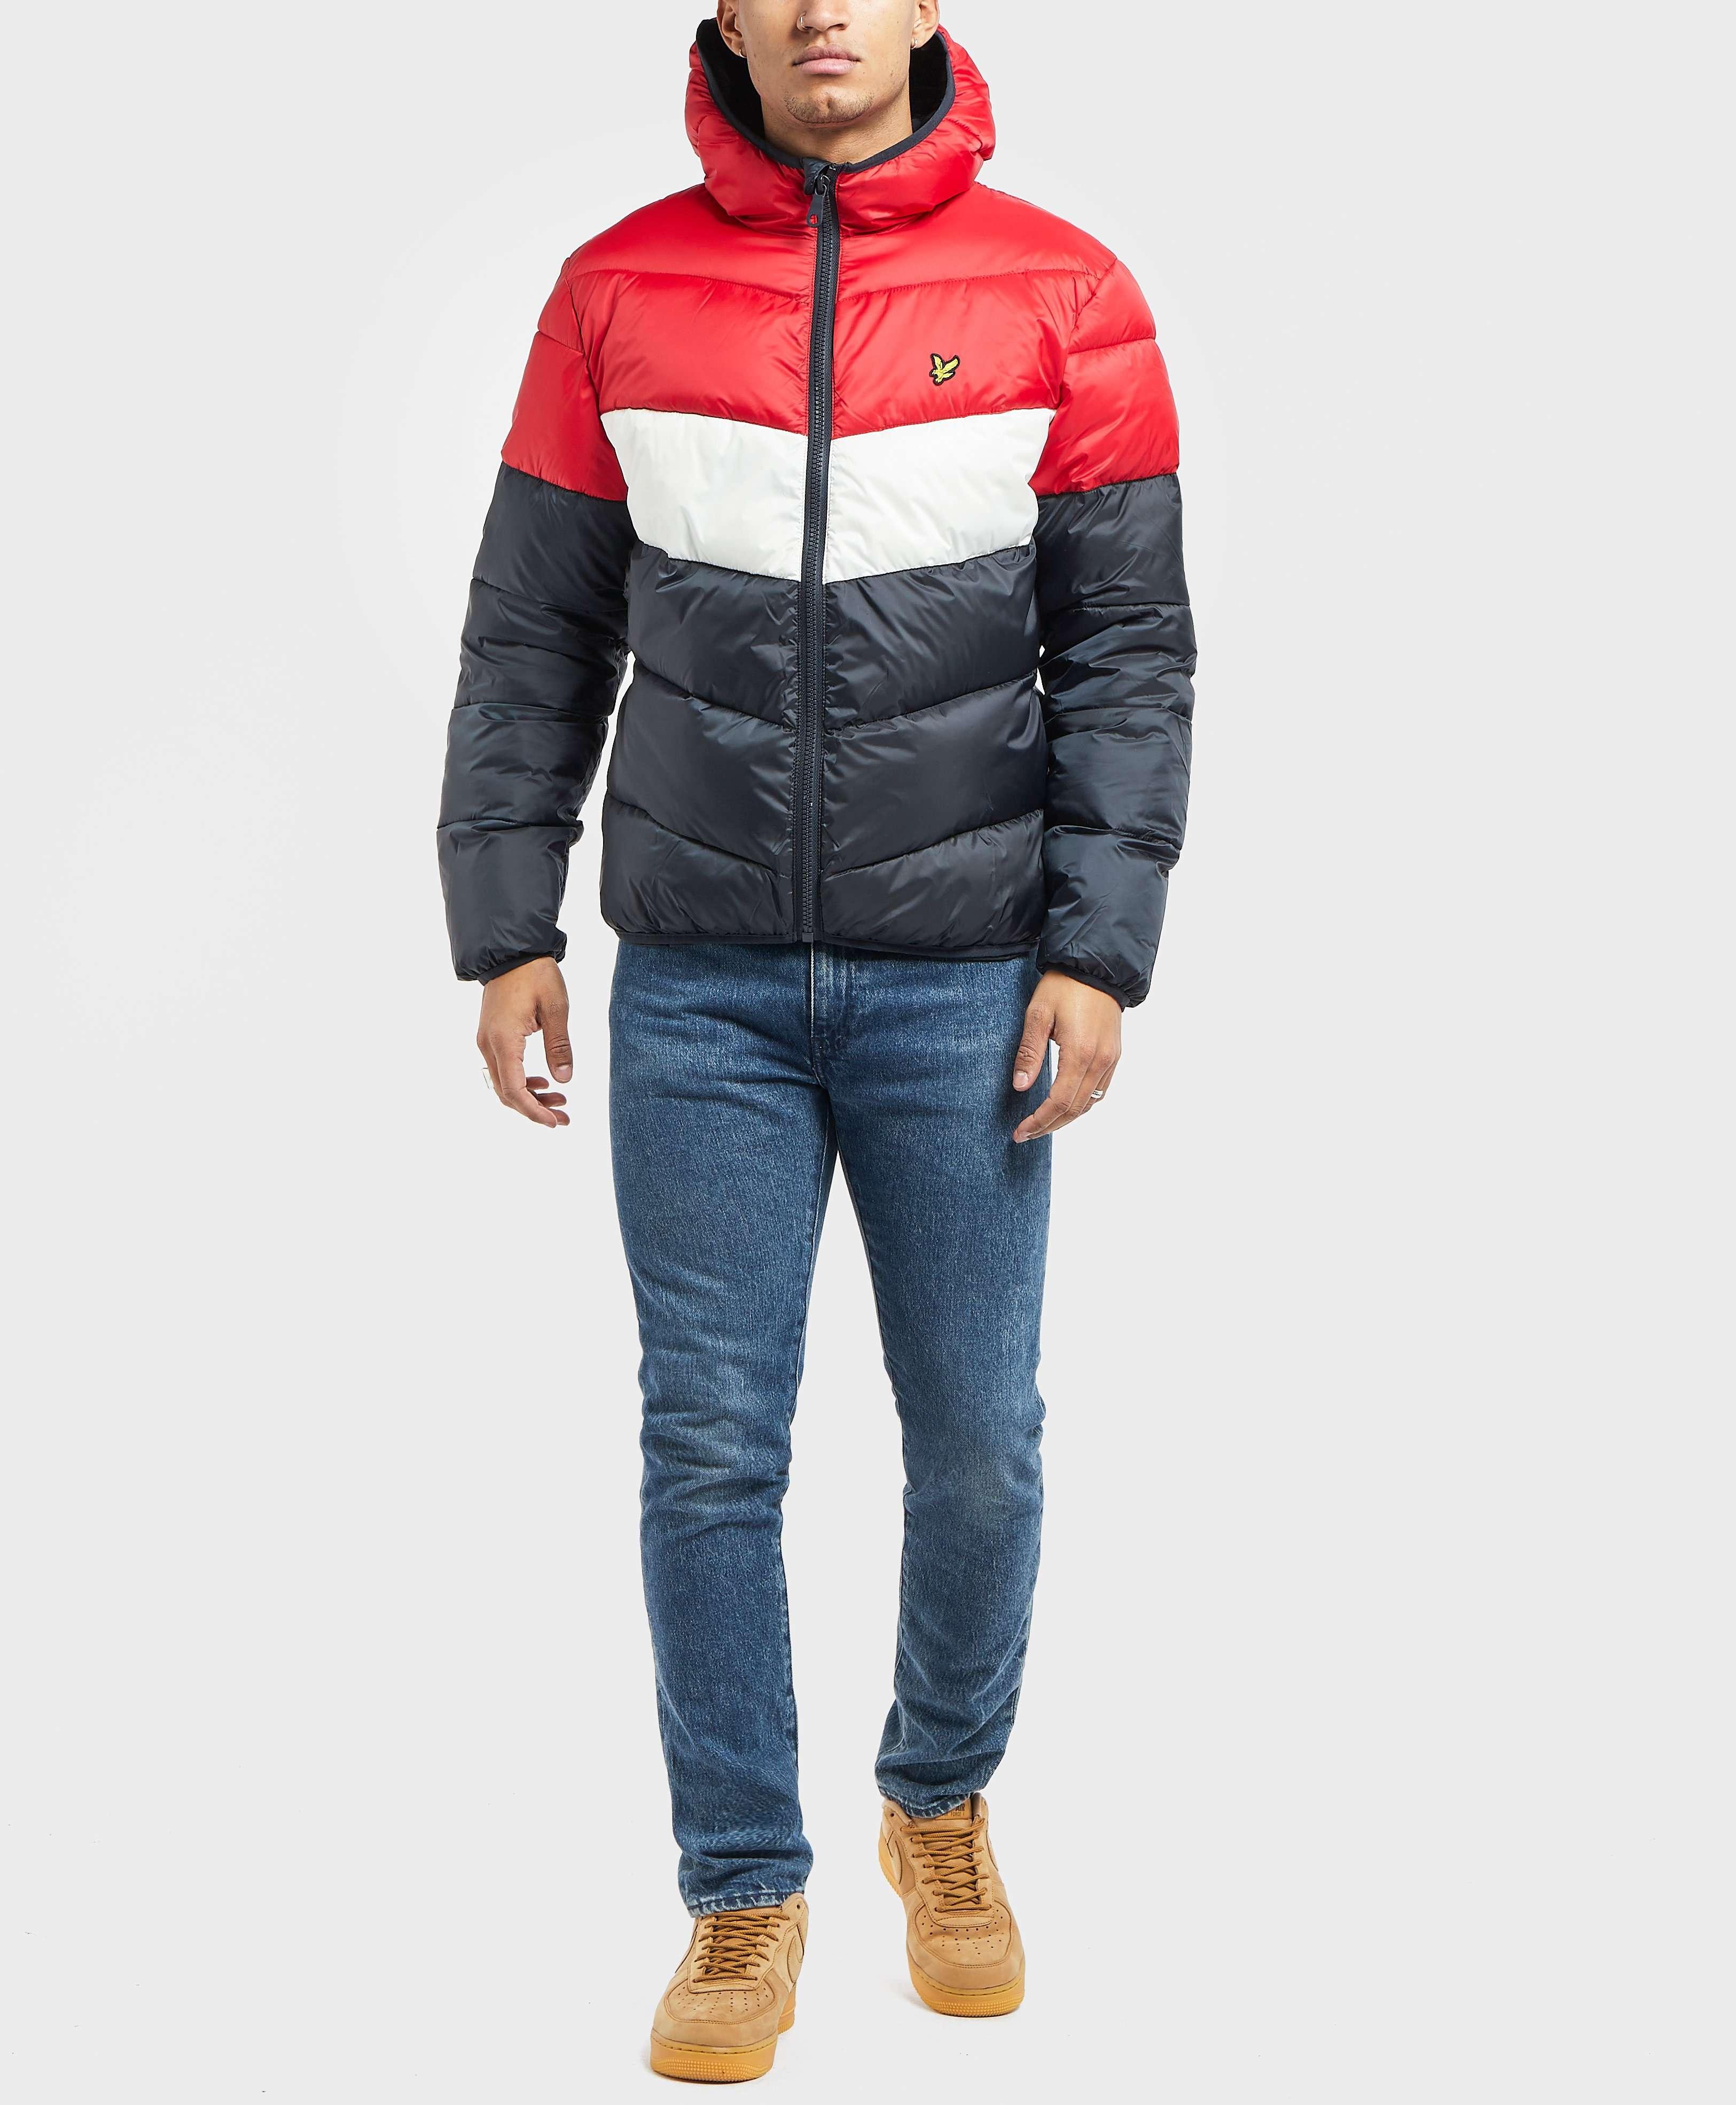 Lyle & Scott Colour Block Padded Jacket